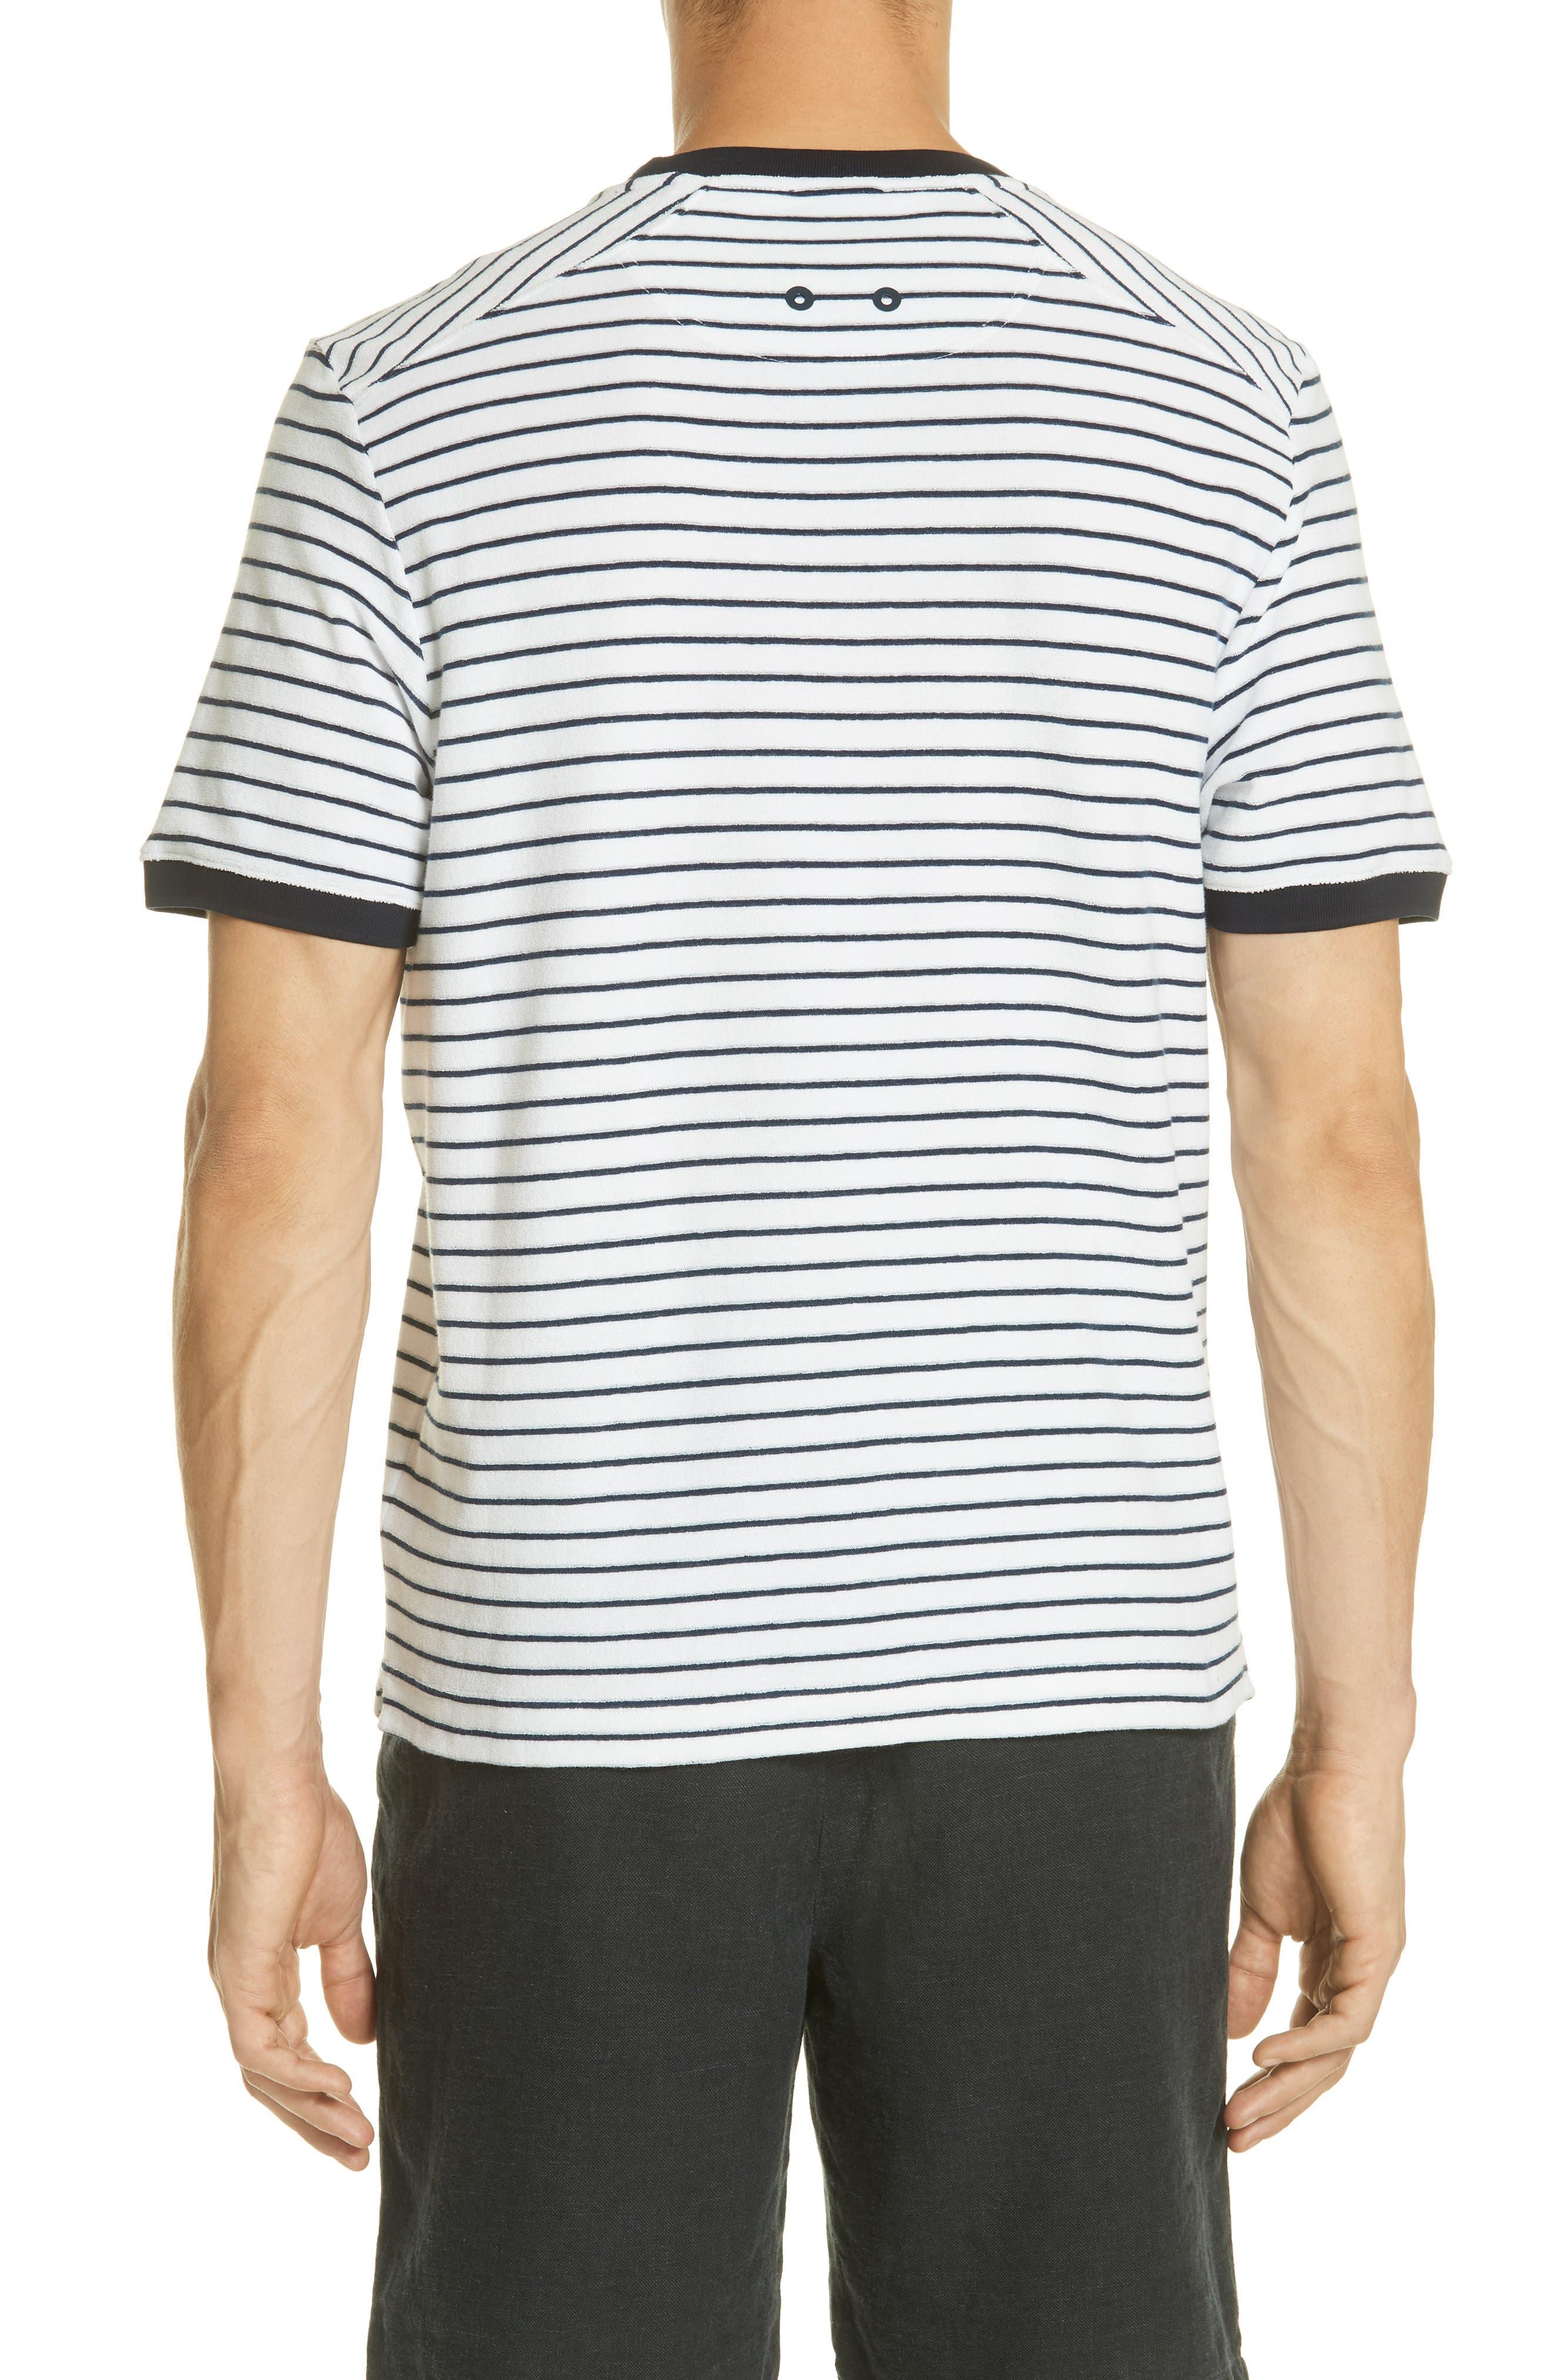 VILEBREQUIN, Stripe Terry T-Shirt, Alternate thumbnail 2, color, 402